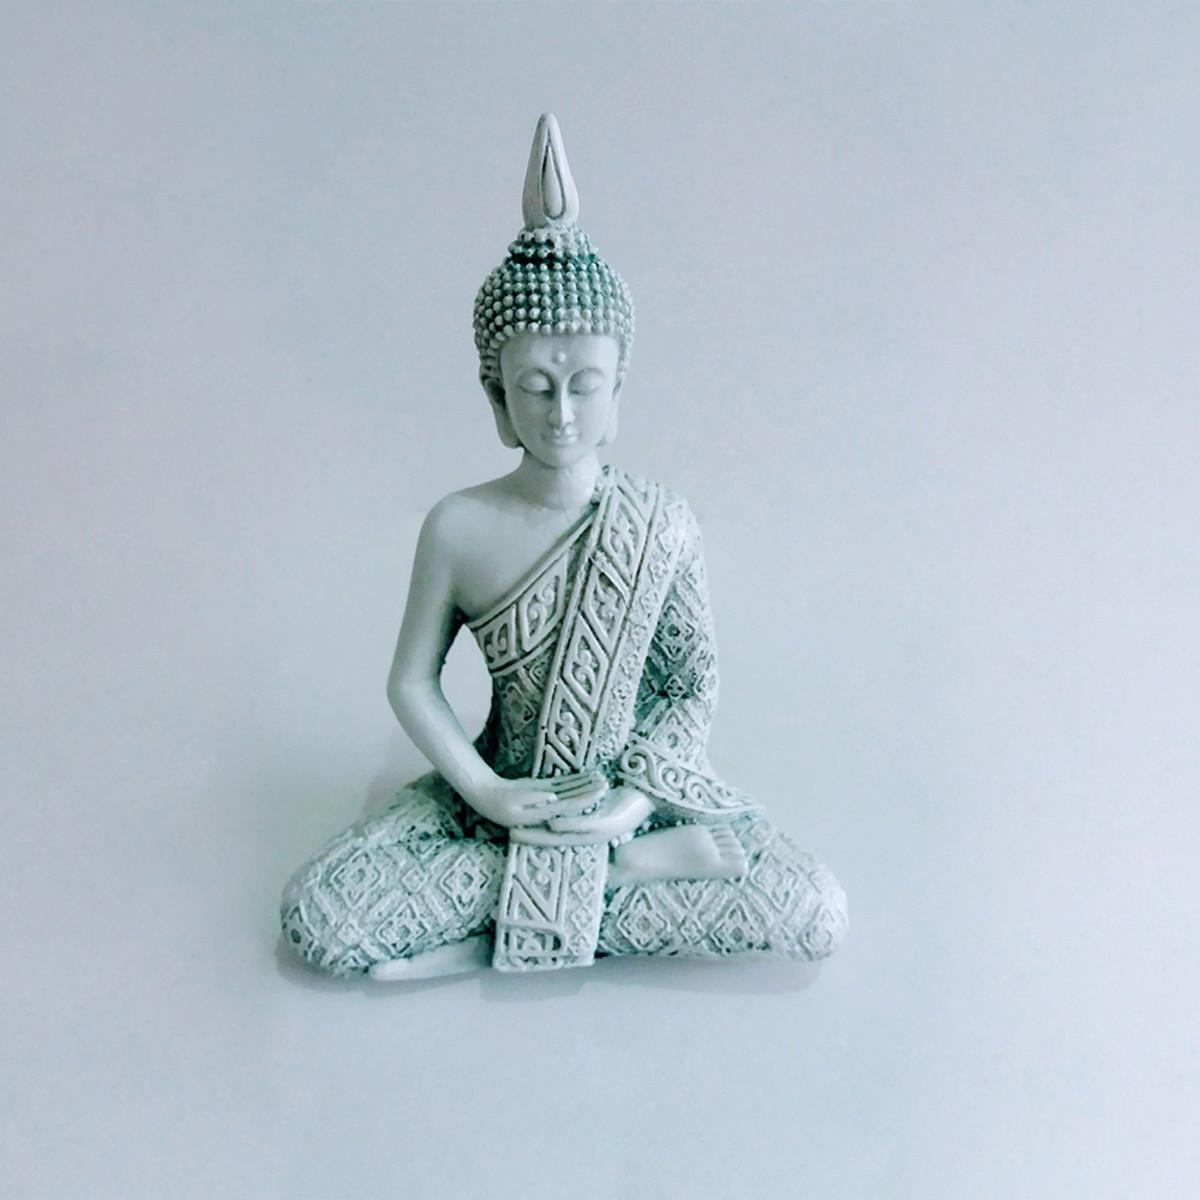 a2490bfe75 Estatueta Decorativa Buda Tibetano Branca no Elo7 | Loja Online ...